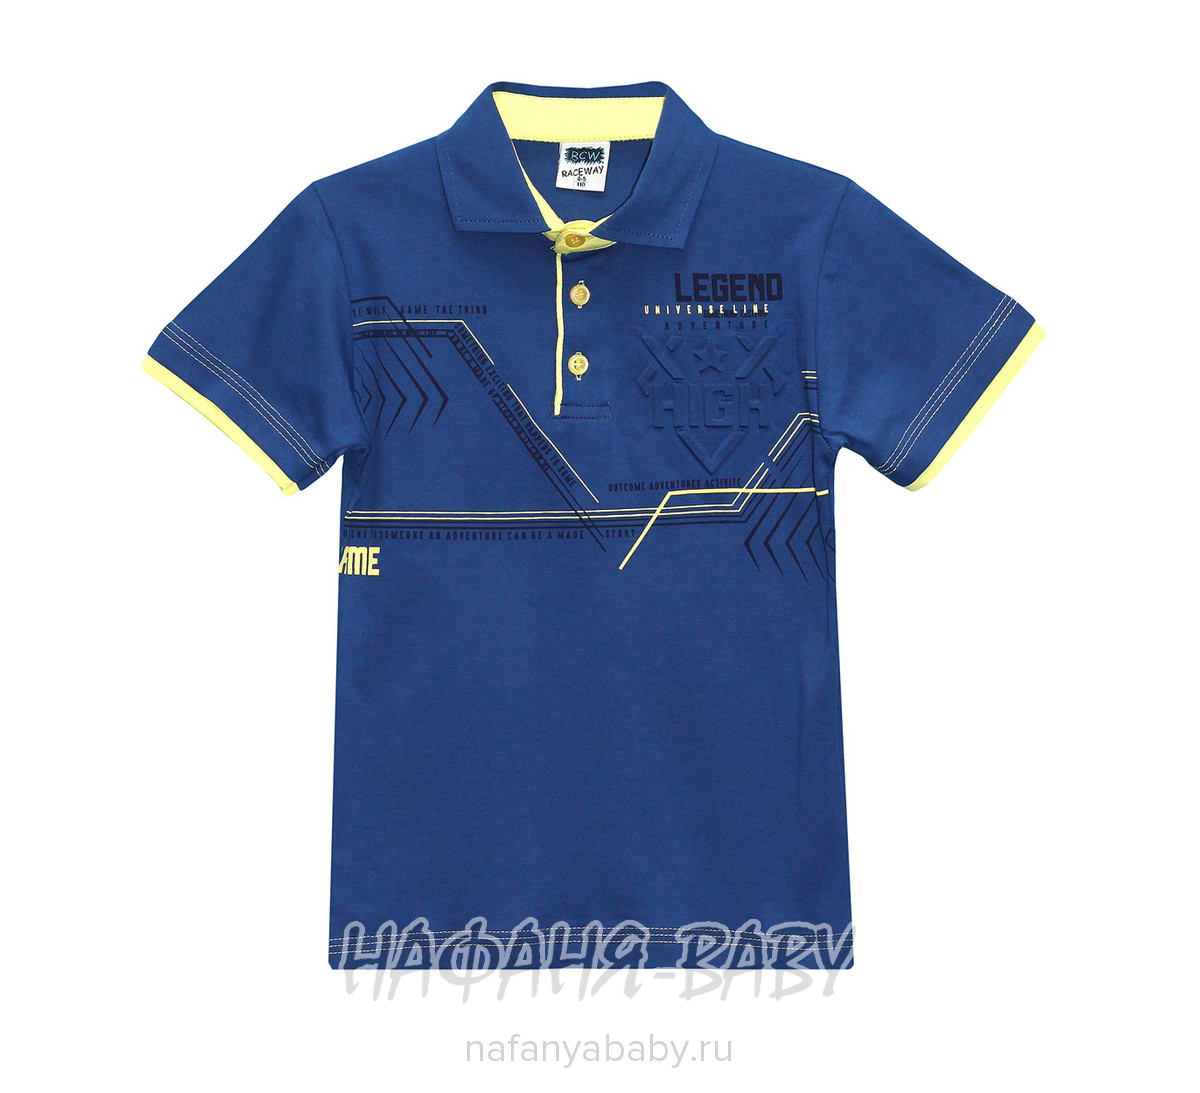 Детская рубашка-поло RCW арт: 5434, 5-9 лет, цвет серый меланж, оптом Турция